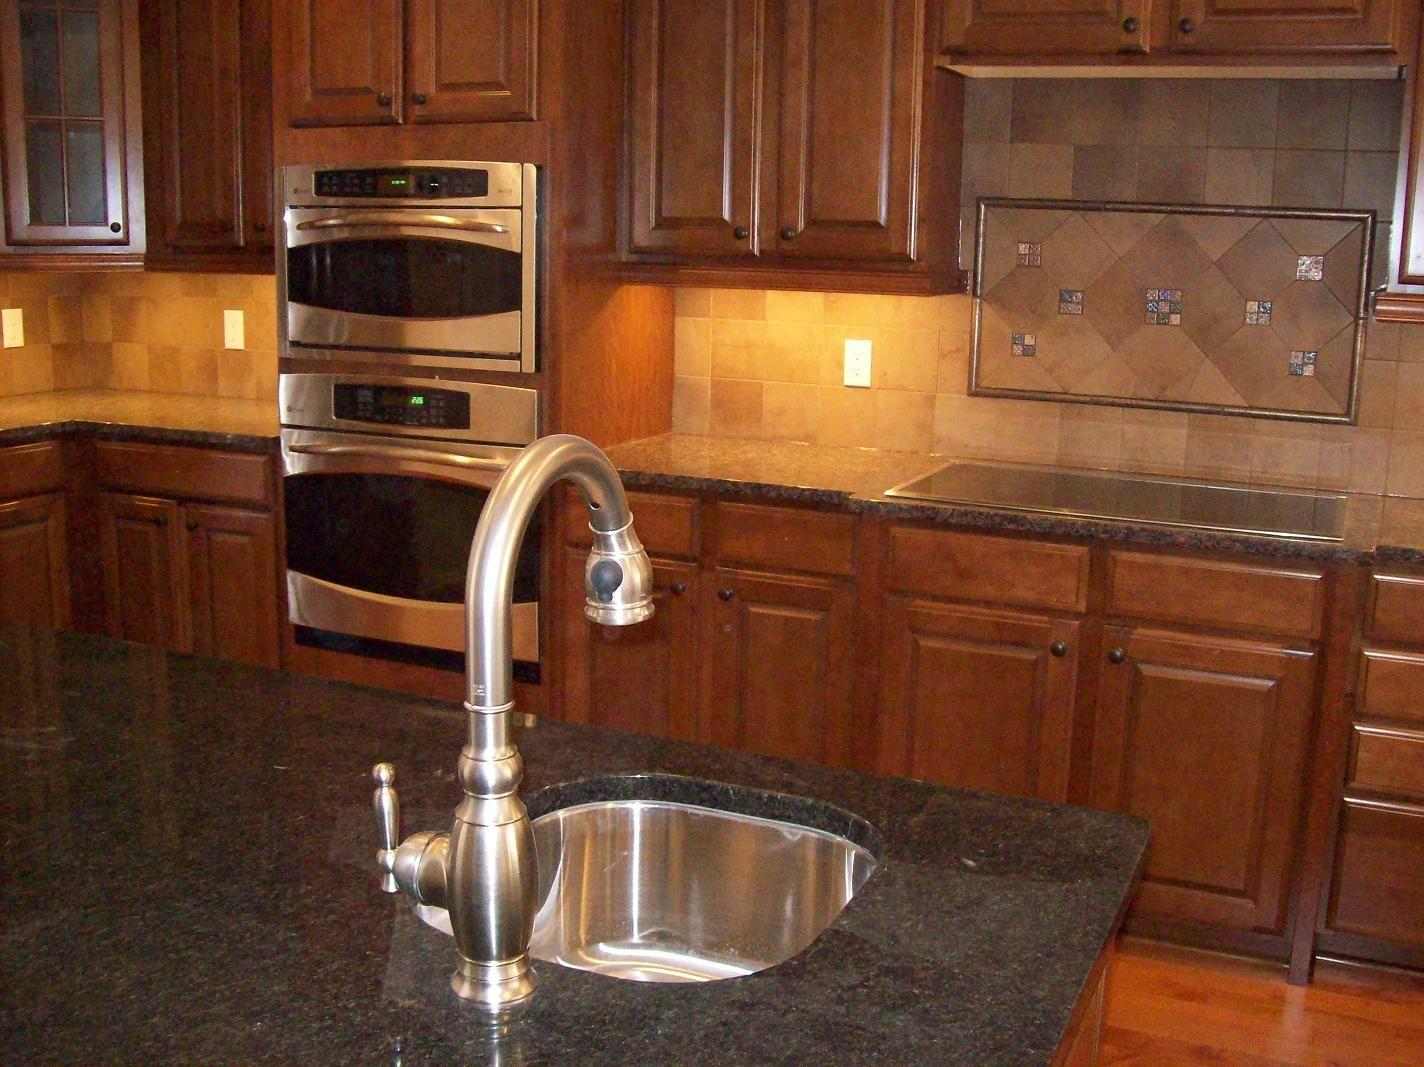 back splashes backsplash for kitchens Travertine with A Diagonal Inlay At DeStefano Remodeling in North Texas we desire to Kitchen TilesKitchen CabinetsKitchen Backsplash